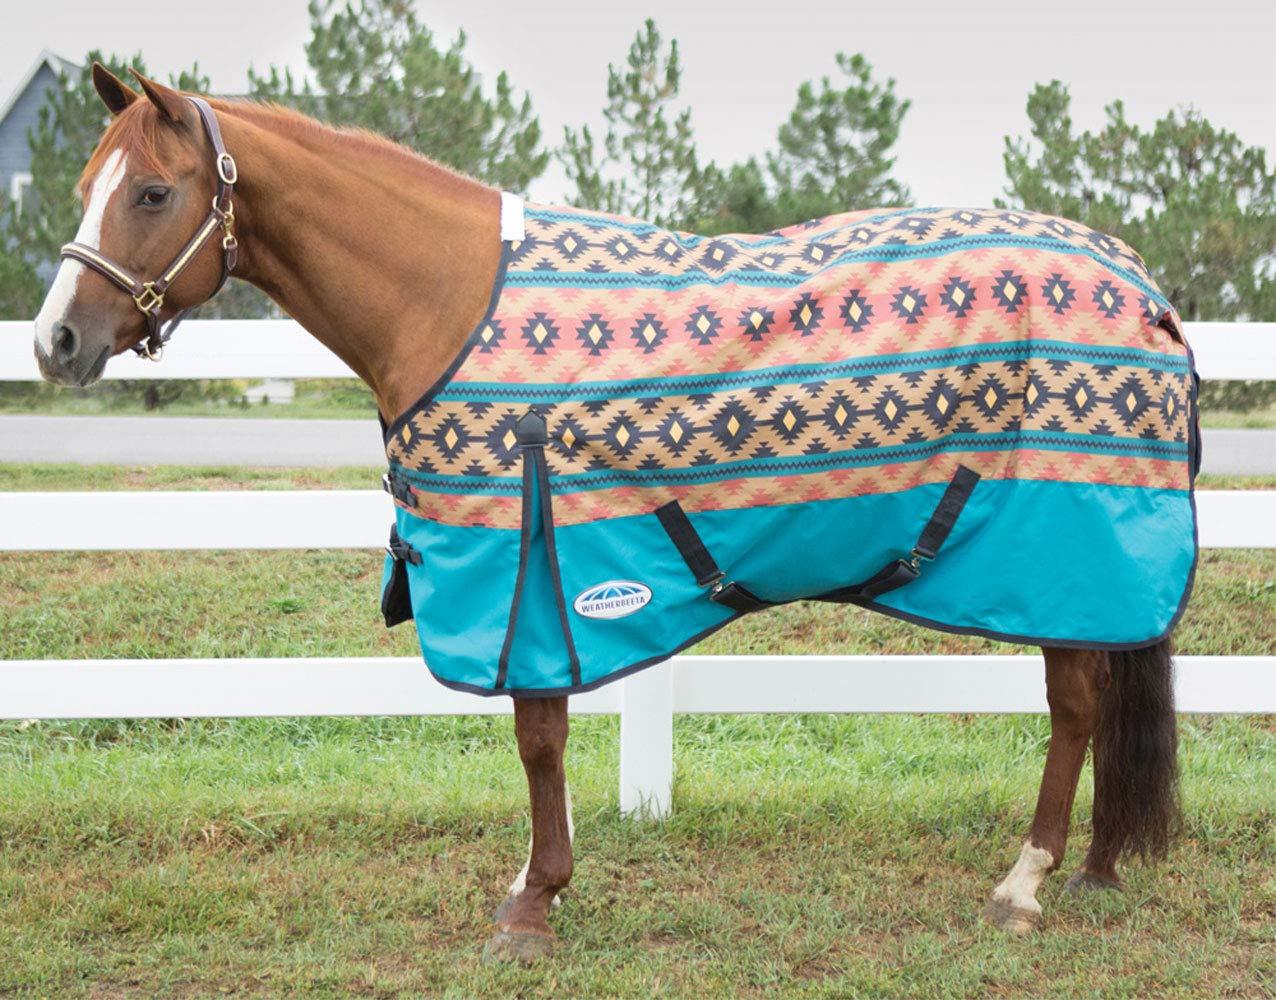 Weatherbeeta WB ComFiTec Essential Standard Medium Blanket Weatherbeeta USA Inc.